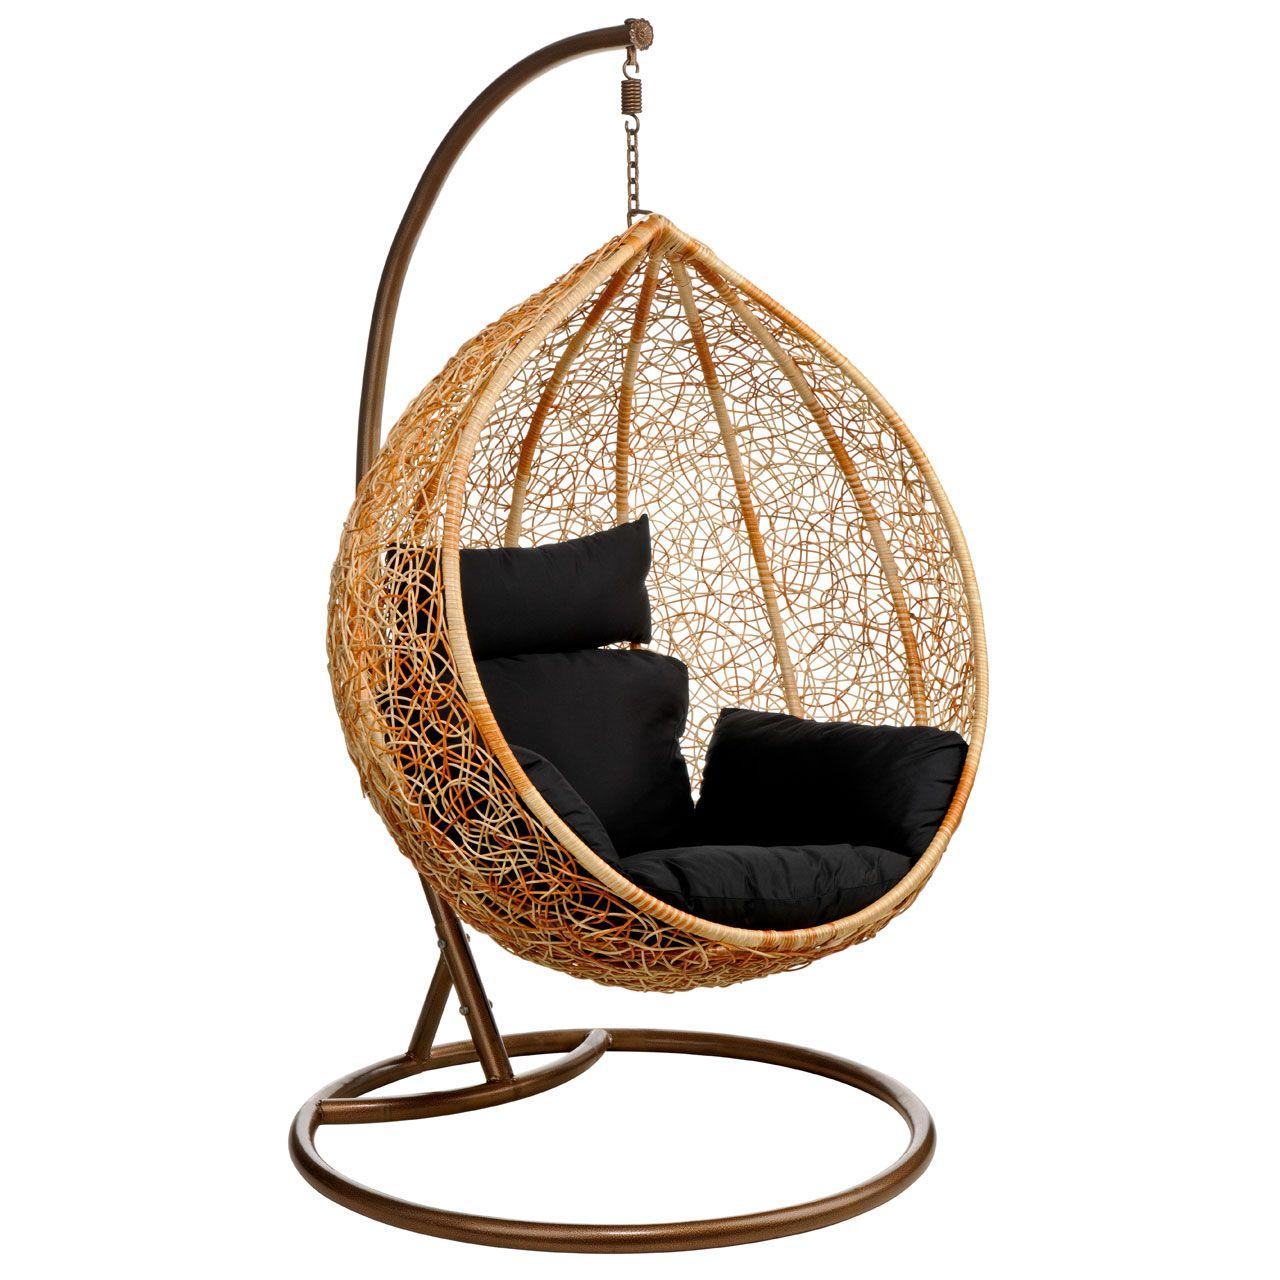 Rattan Hanging Chair 2402692 A stylish and modern take